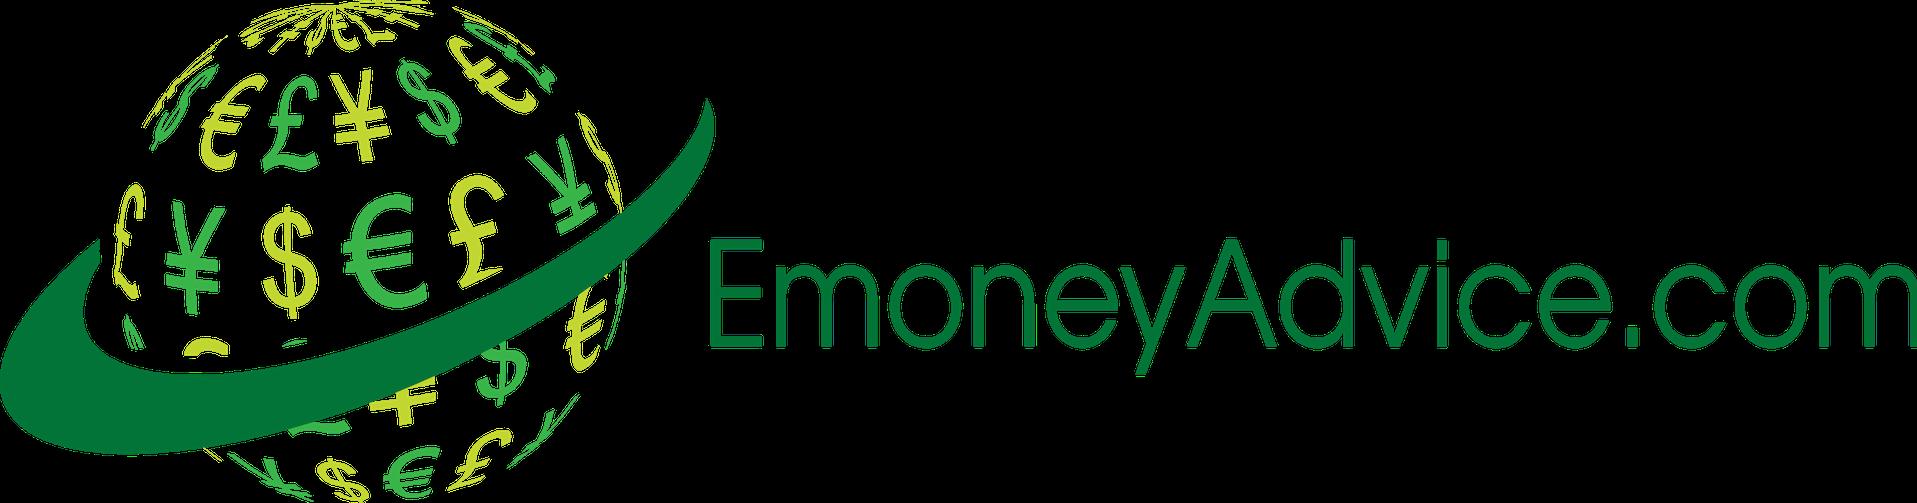 EmoneyAdvice